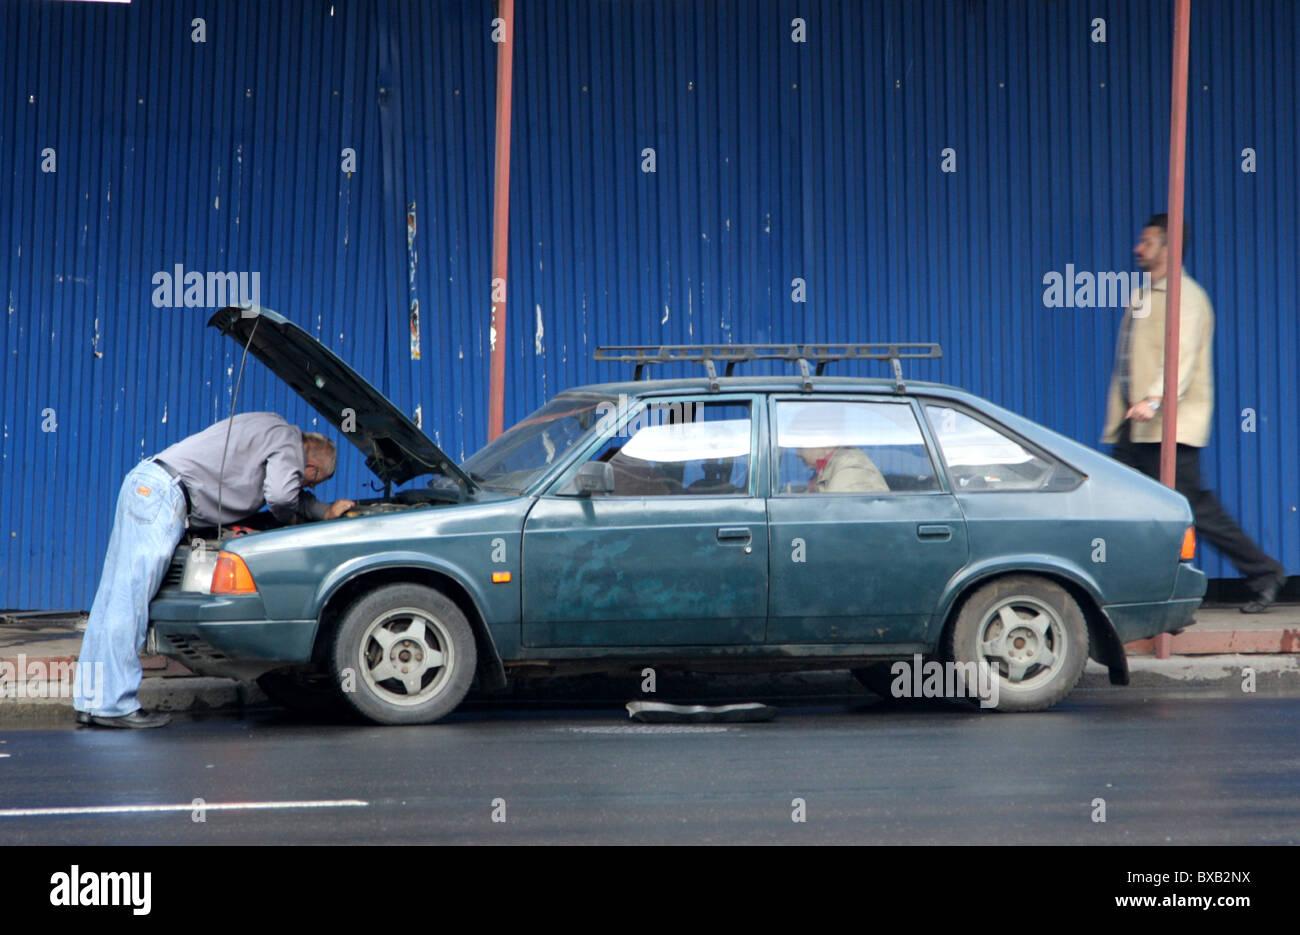 Wunderbar Autoausfall Galerie - Elektrische Schaltplan-Ideen ...